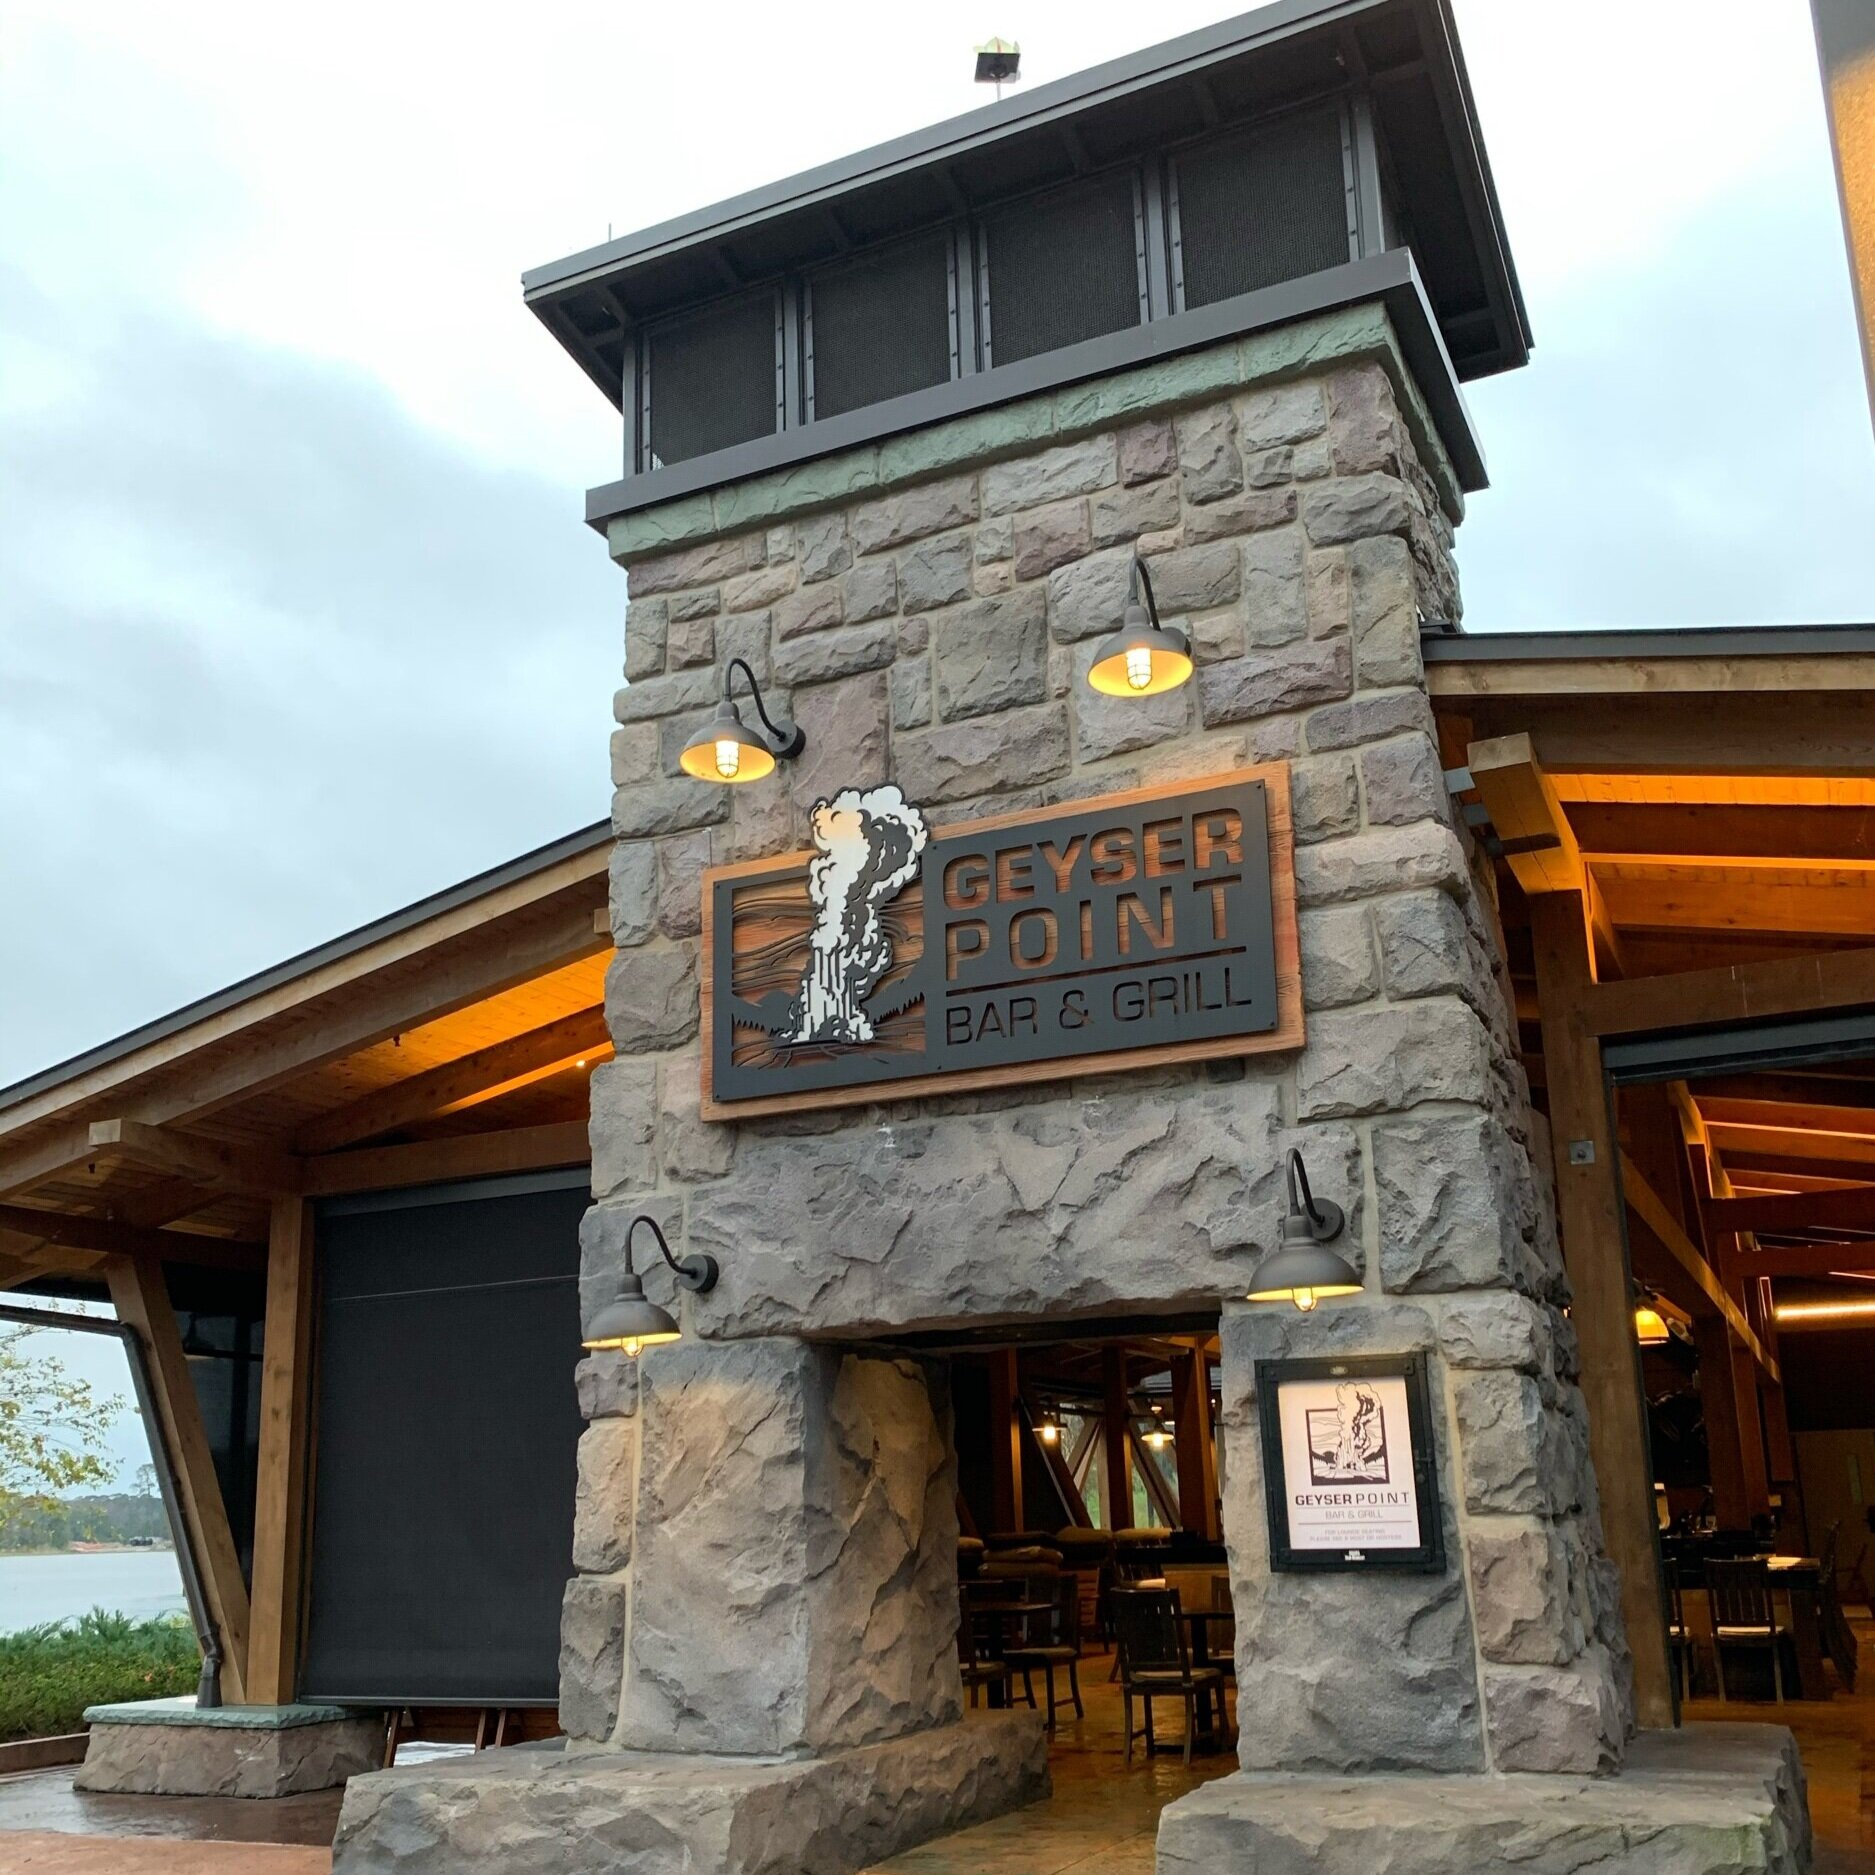 Geyser Point Bar & Grill at Disney's Wilderness Lodge